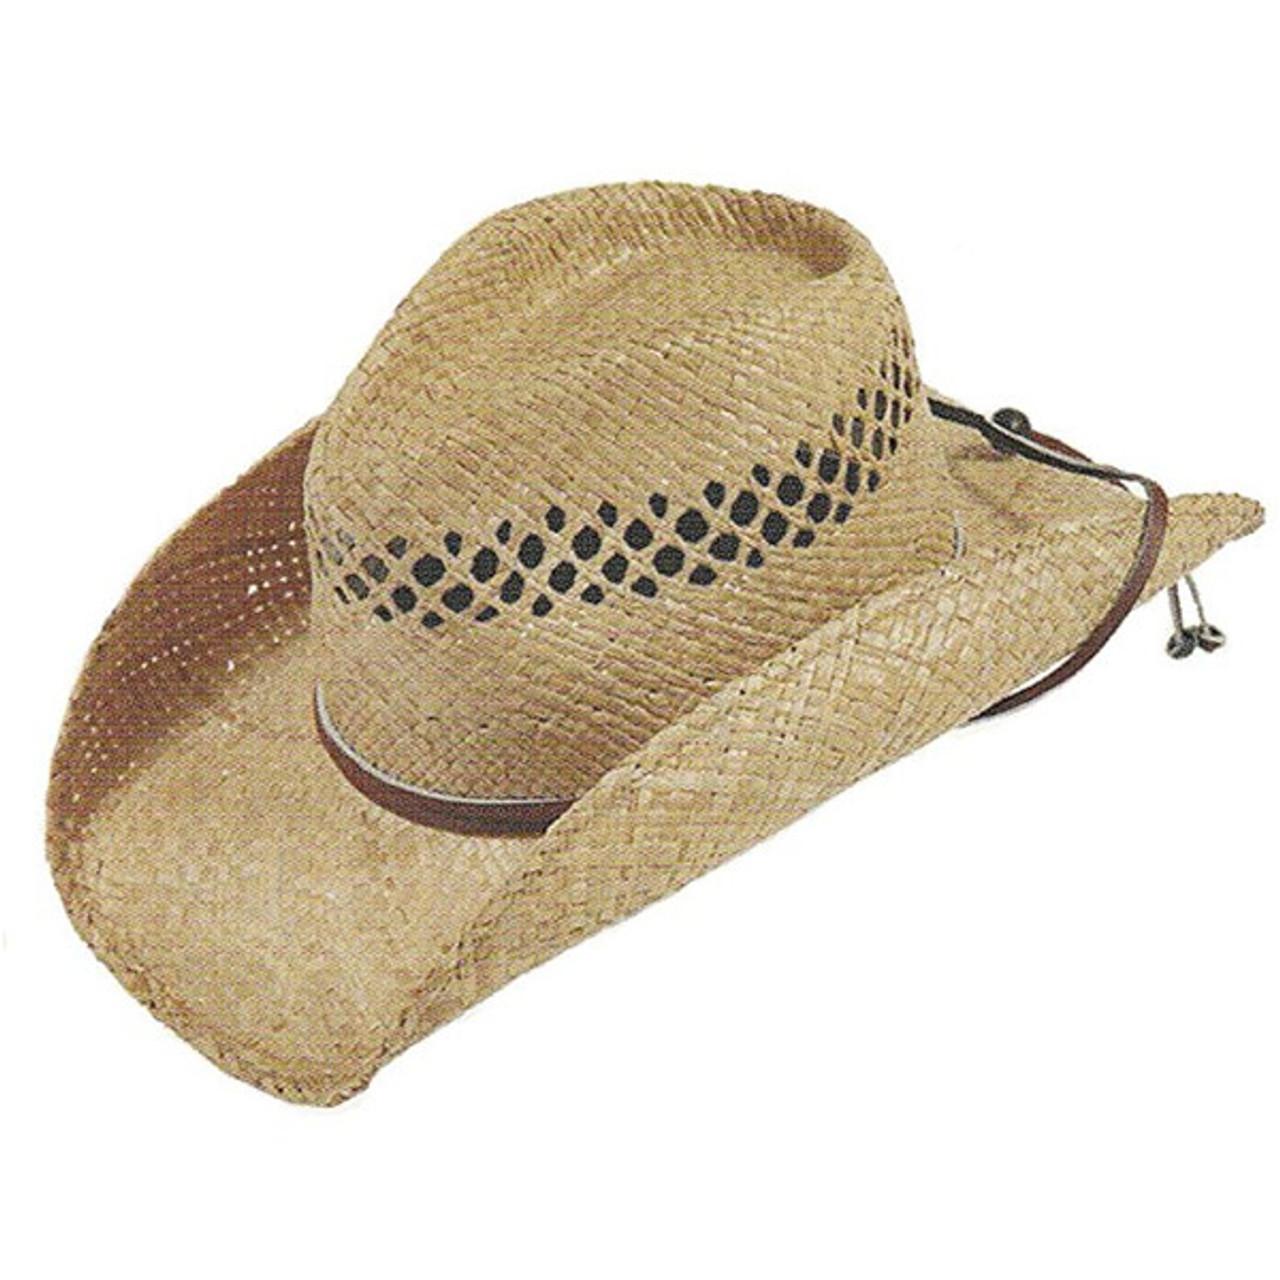 be11f04f20e77 Stetson | Bridger Straw Cowboy Hat | Hats Unlimited